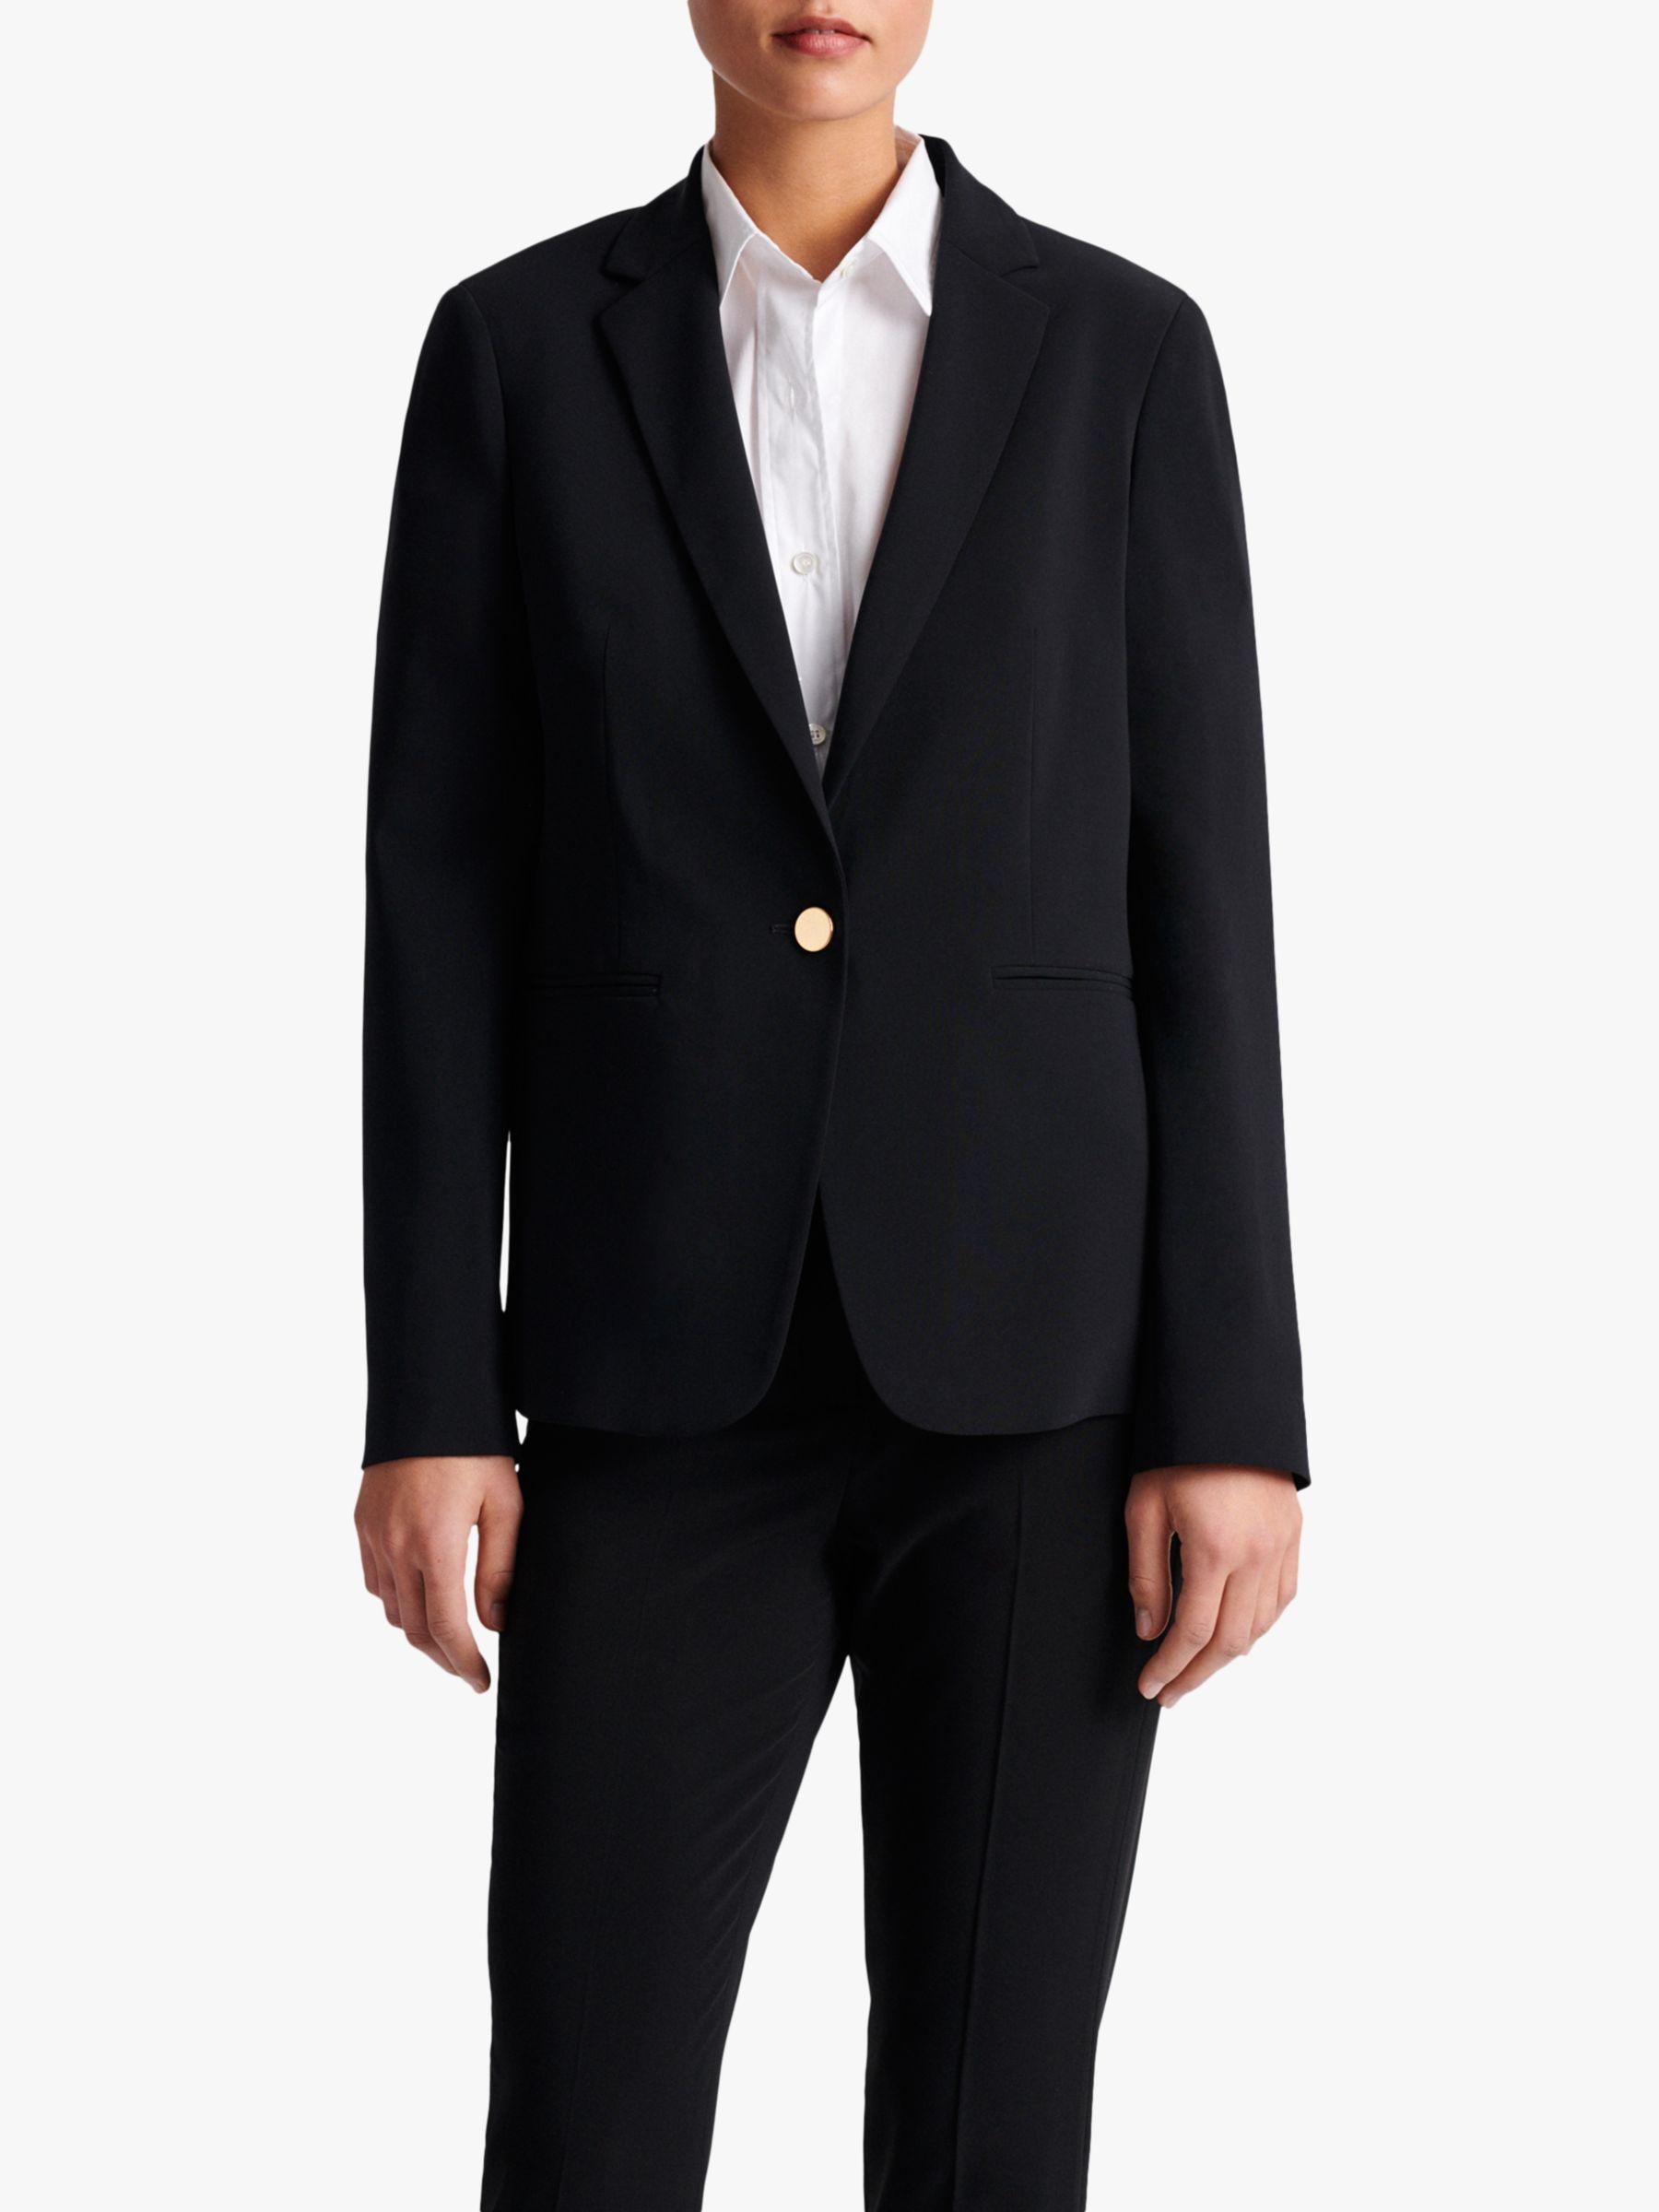 Gerard Darel Gerard Darel Alida Tailored Jacket, Black